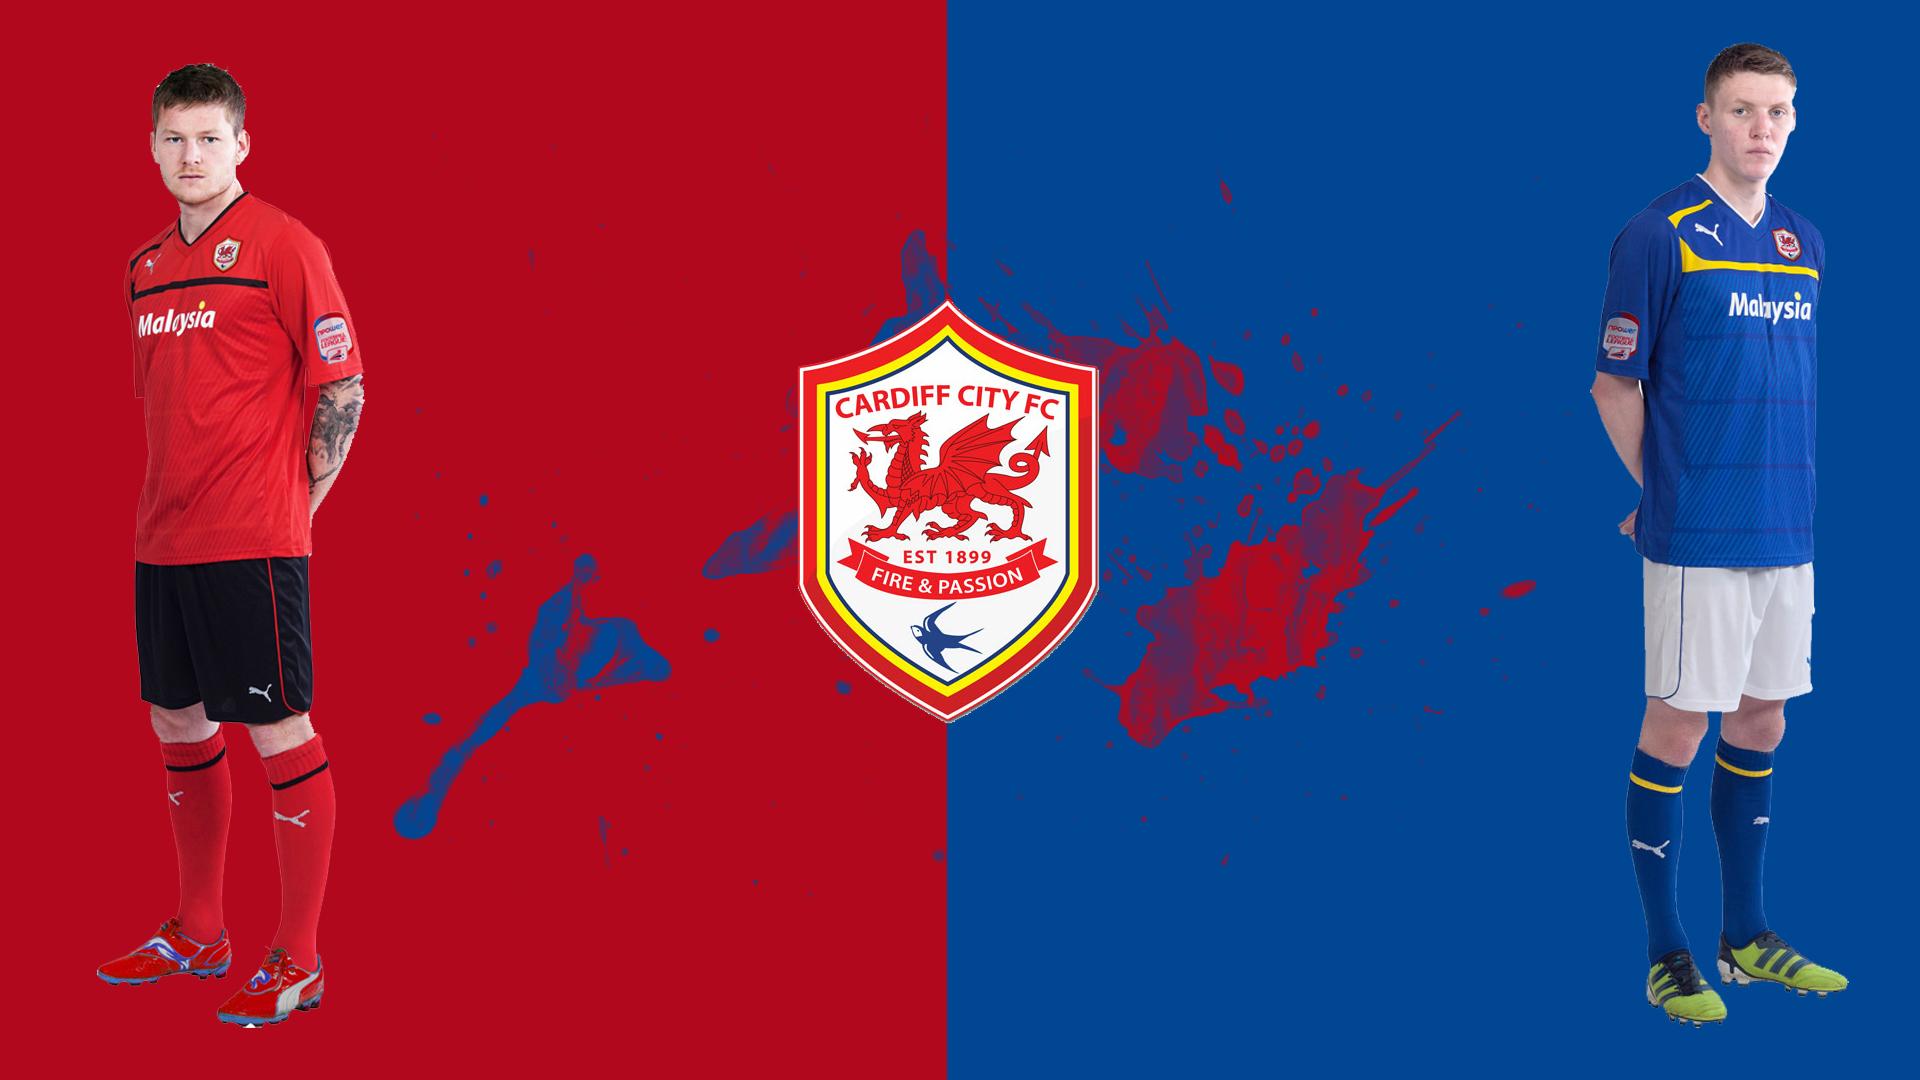 City Football Logo Football Club Cardiff City